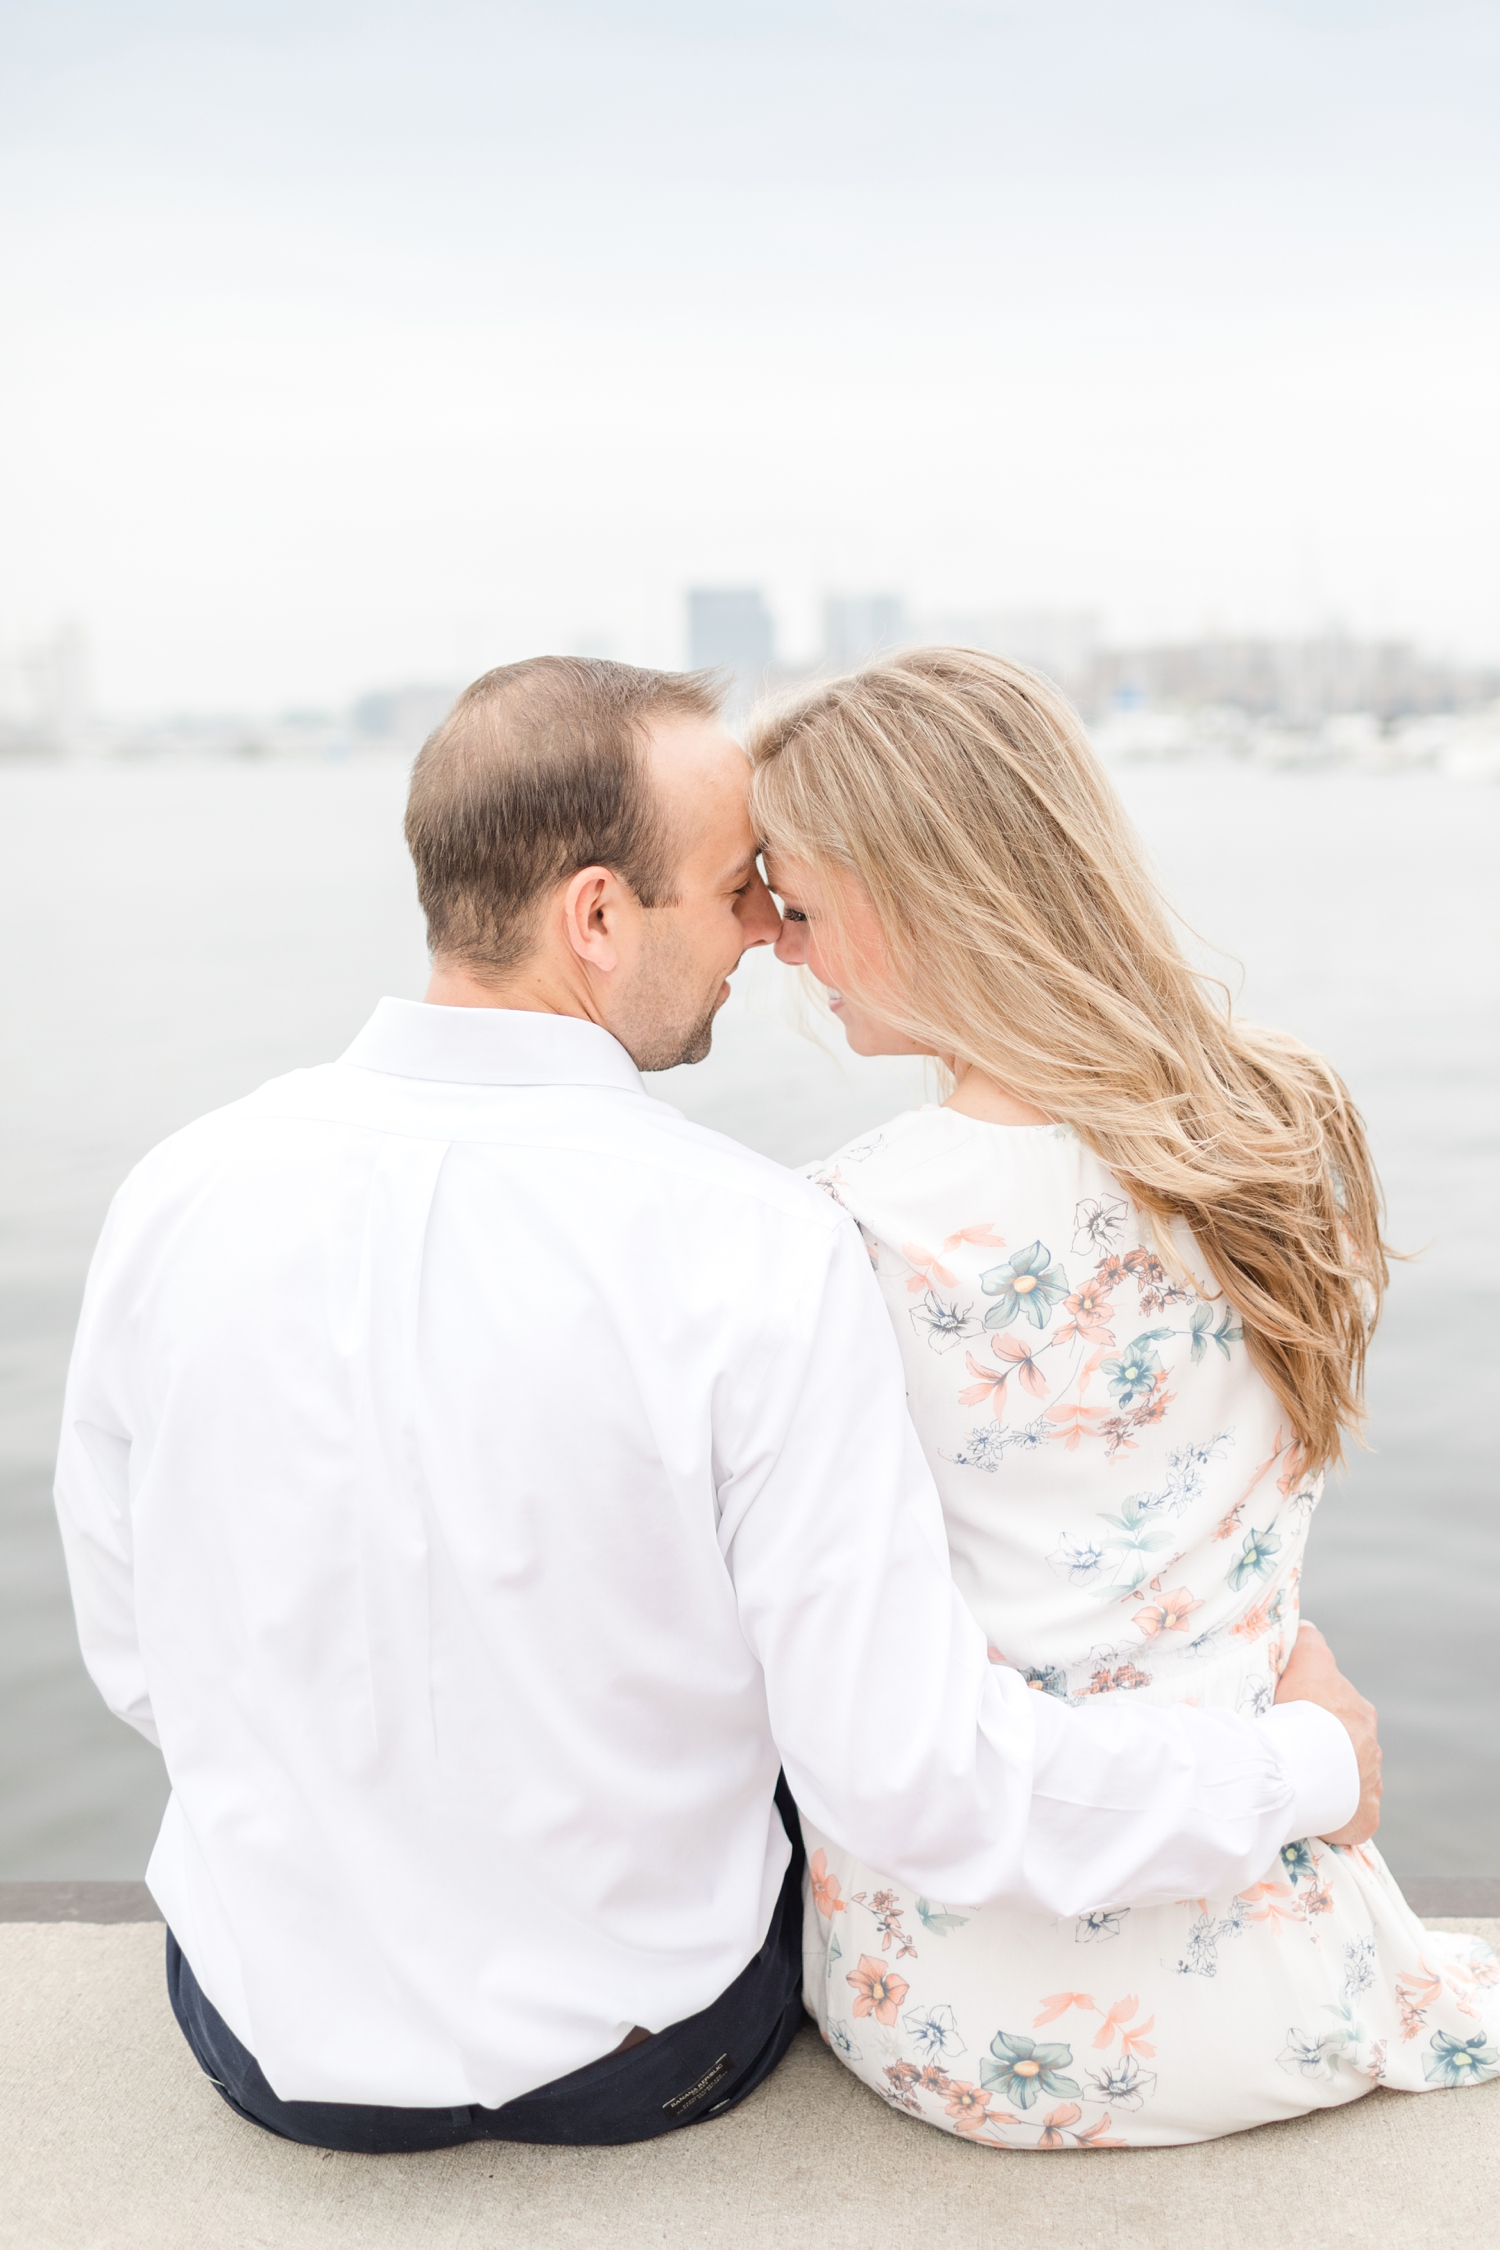 Maddy and Lloyd Engagement-95_Baltimore-Maryland-engagement-photography-Sherwood-Gardens-Maryland-engagement-photographer-anna-grace-photography-photo.jpg